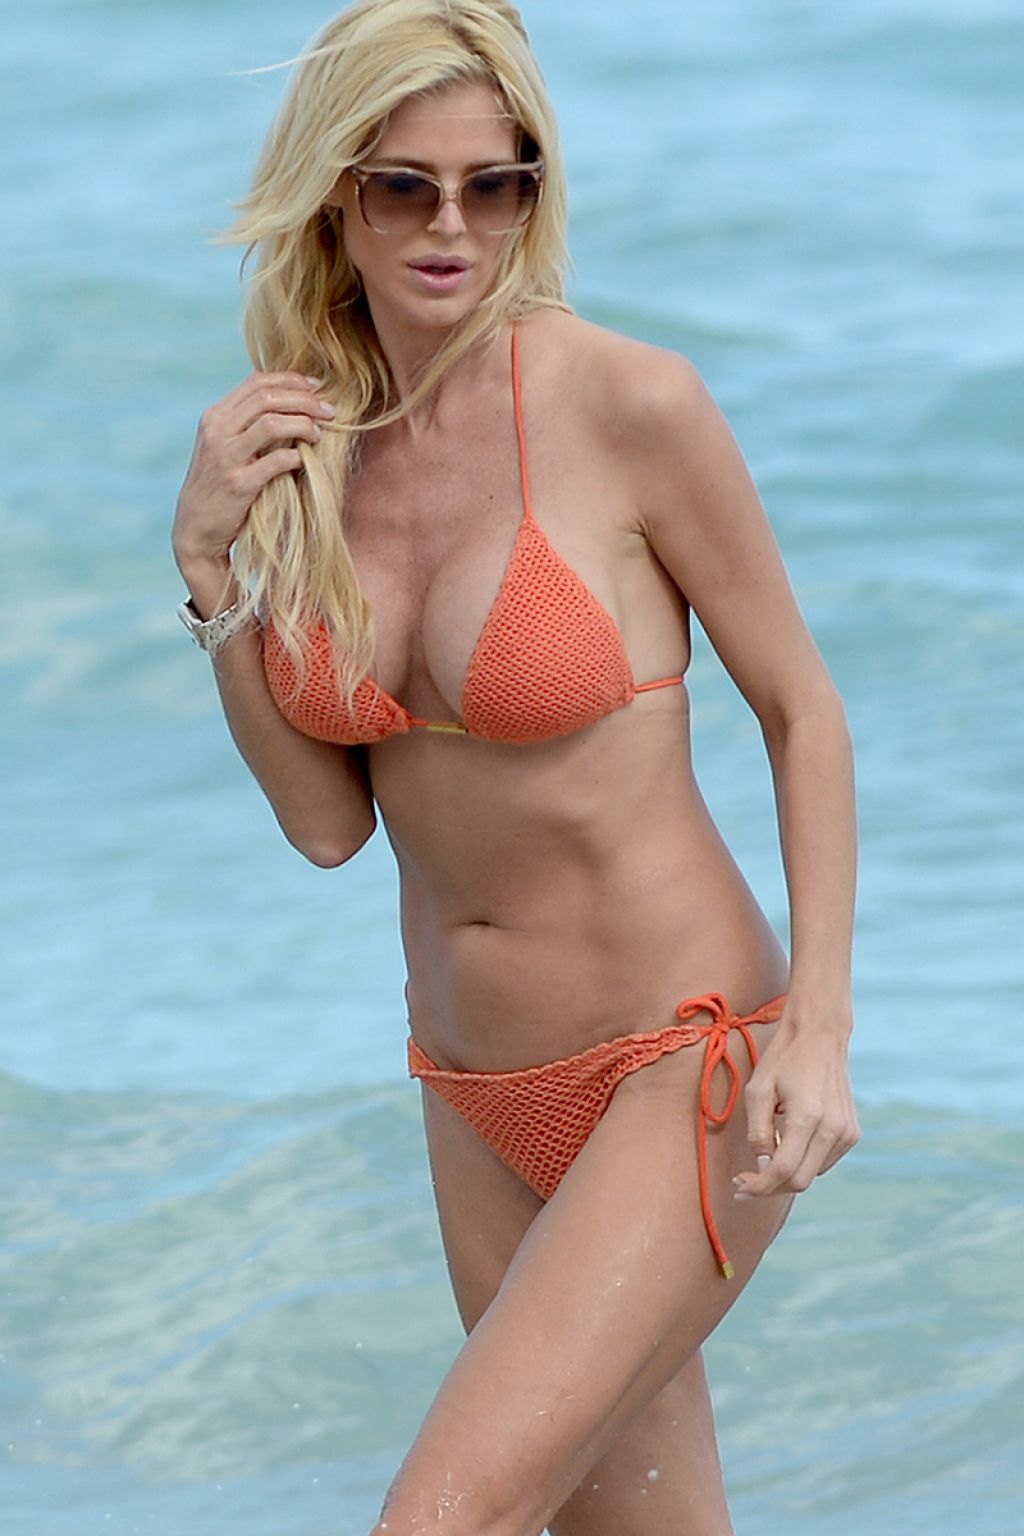 Victoria Silvstedt Wears An Orange Mesh String Bikini On The Beach In Miami, February 2015